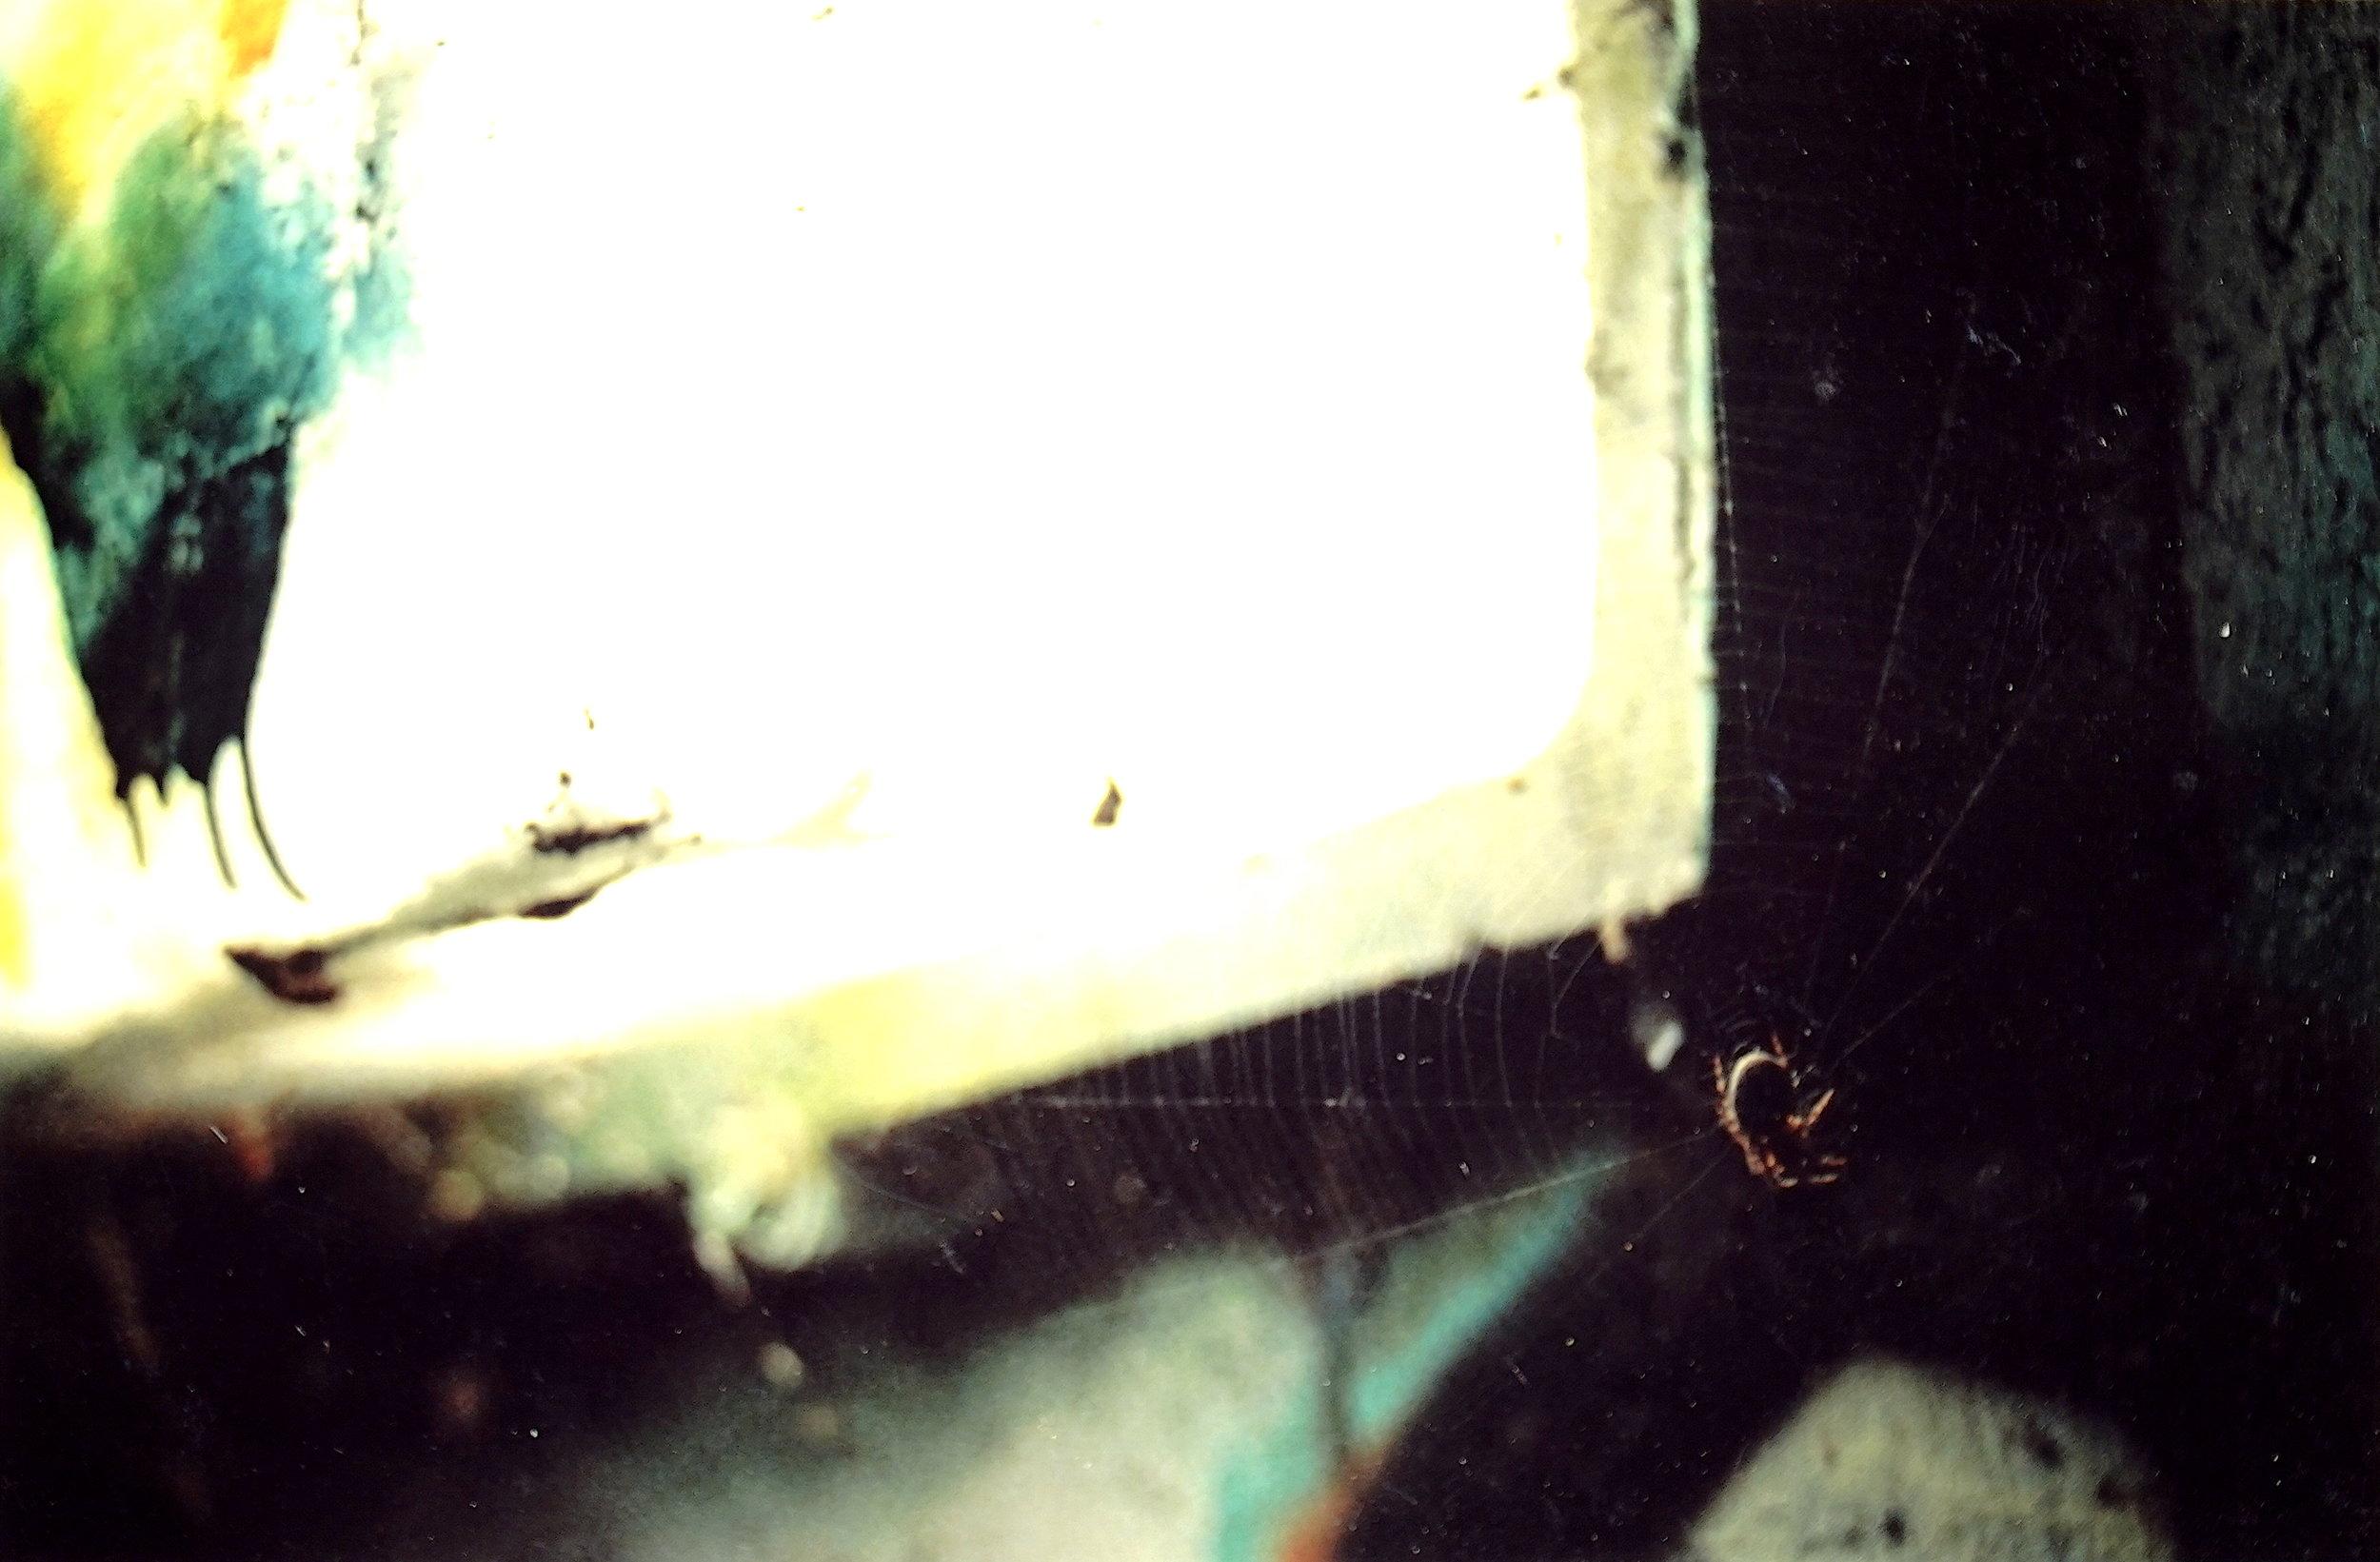 UNDERPASS LIGHT SPIDERS (2006)